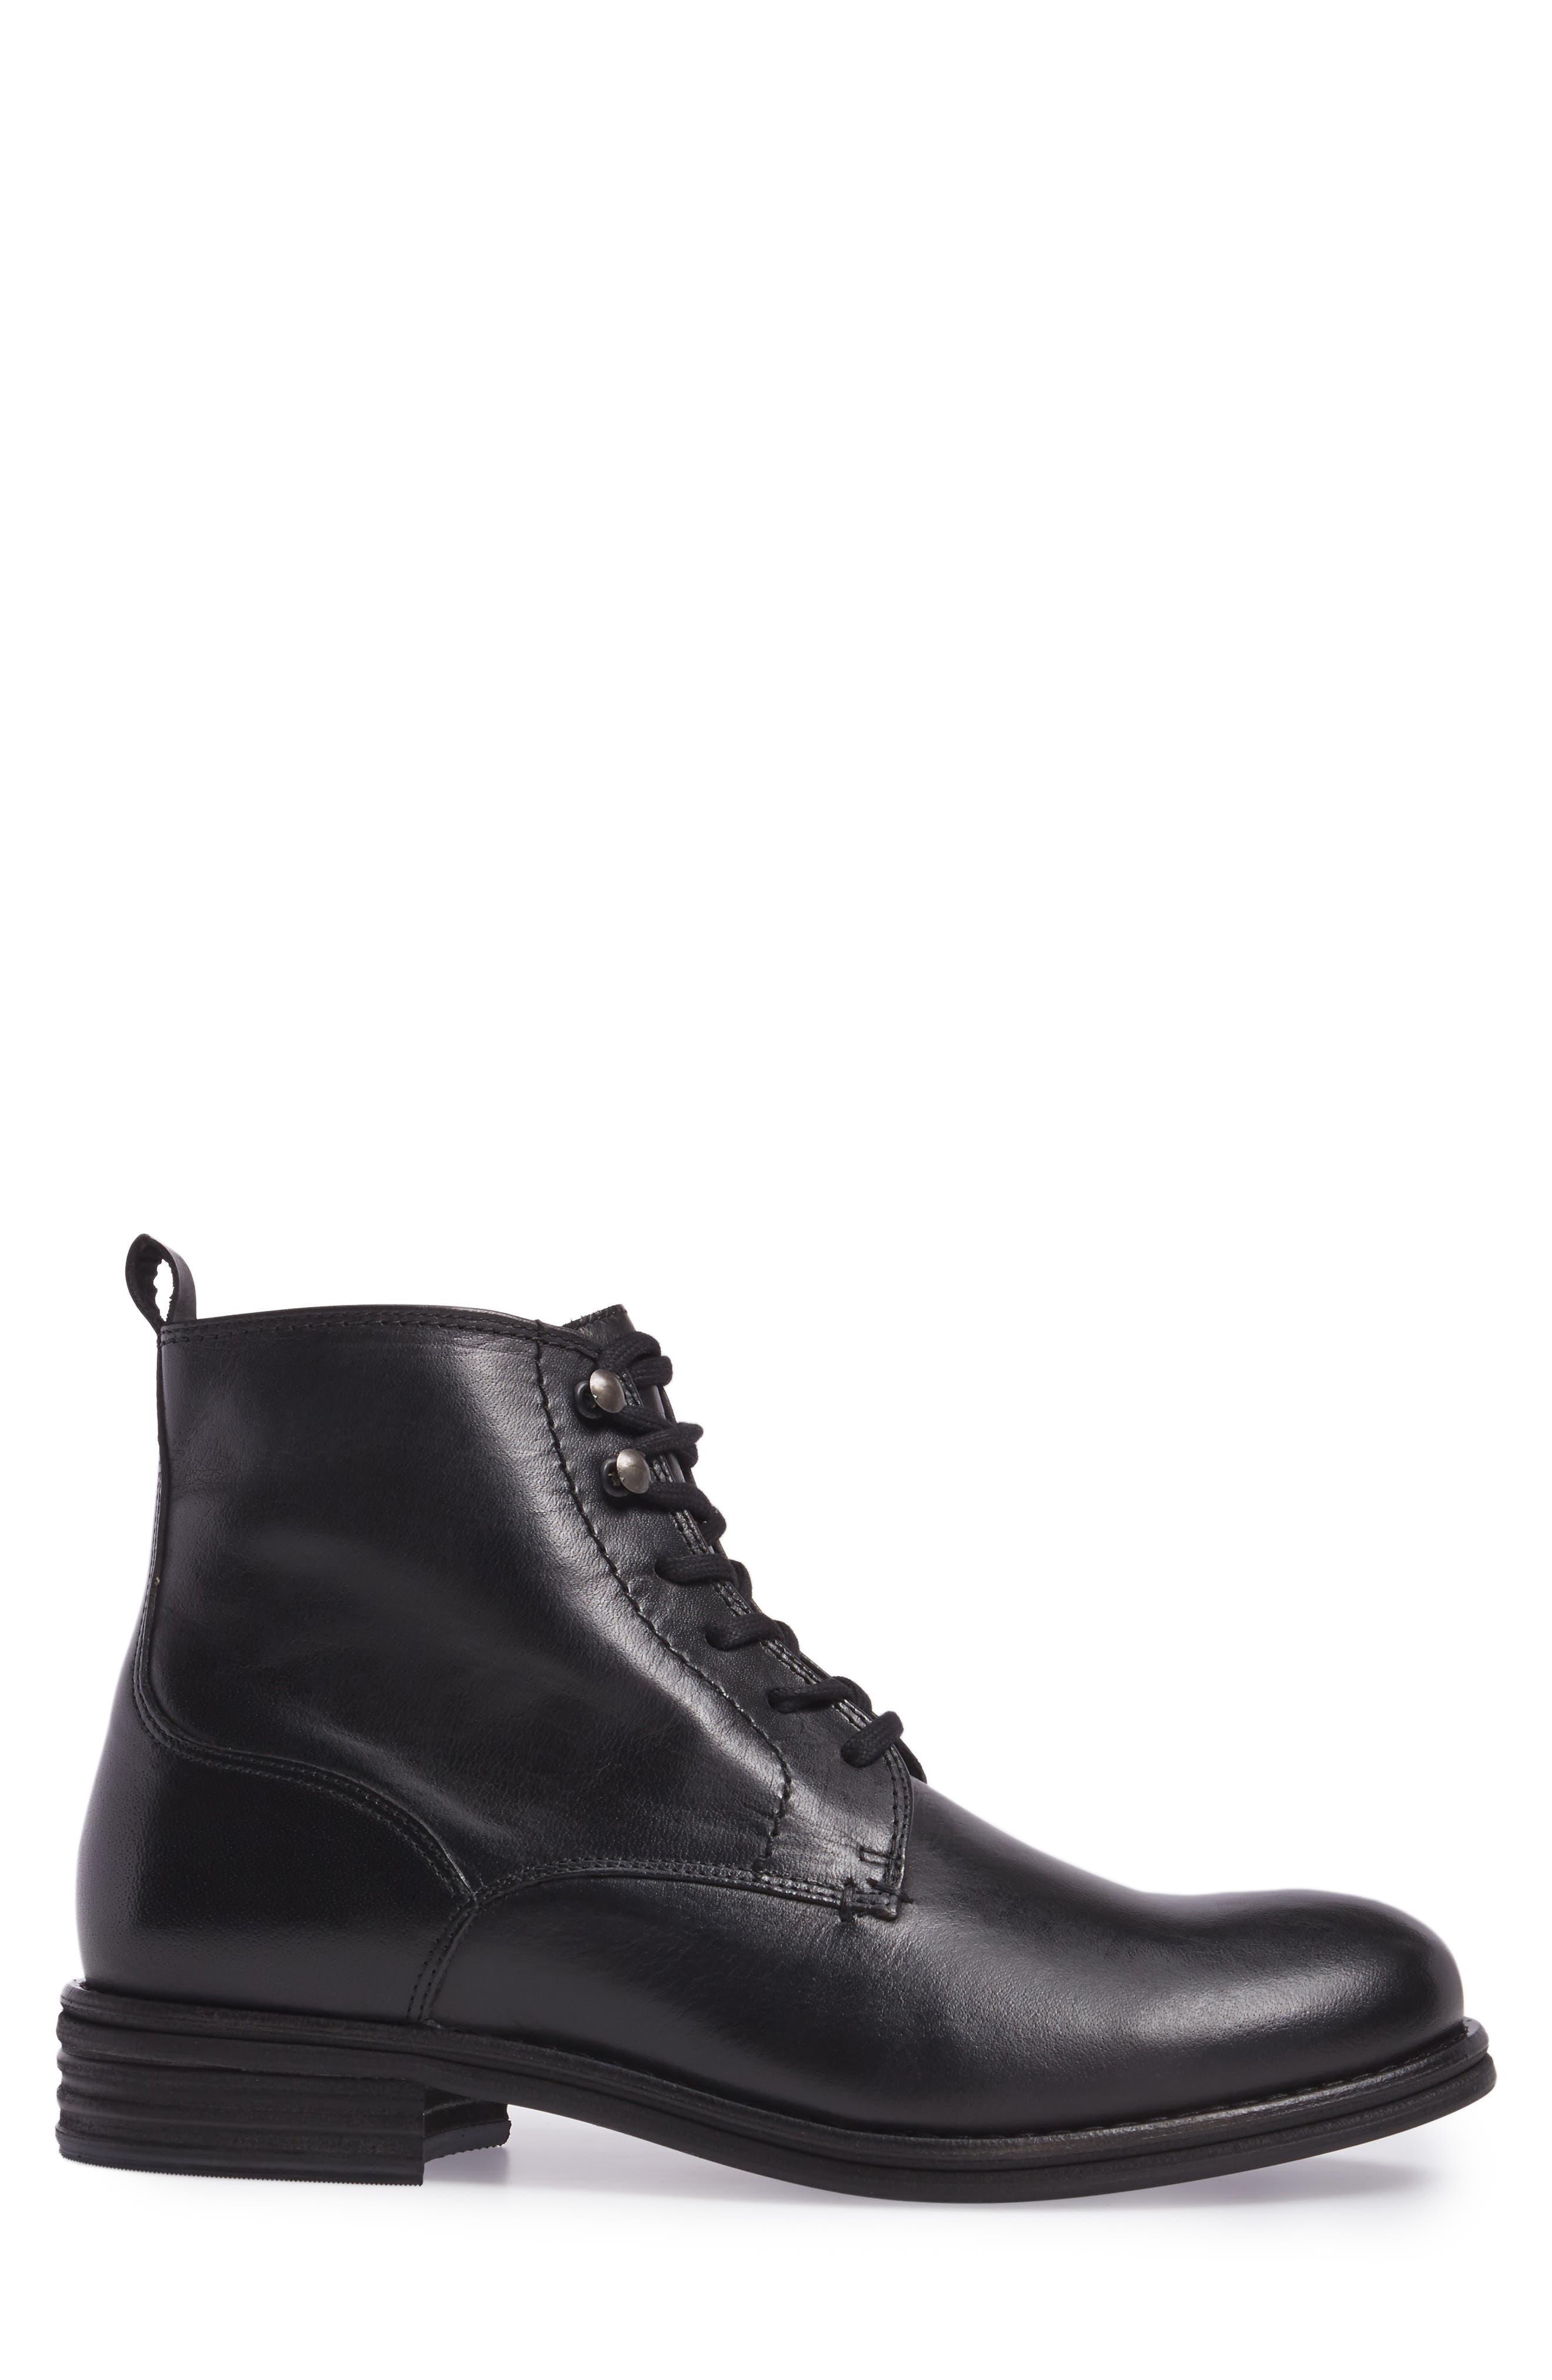 VINCE CAMUTO,                             Cordie Plain Toe Boot,                             Alternate thumbnail 3, color,                             001